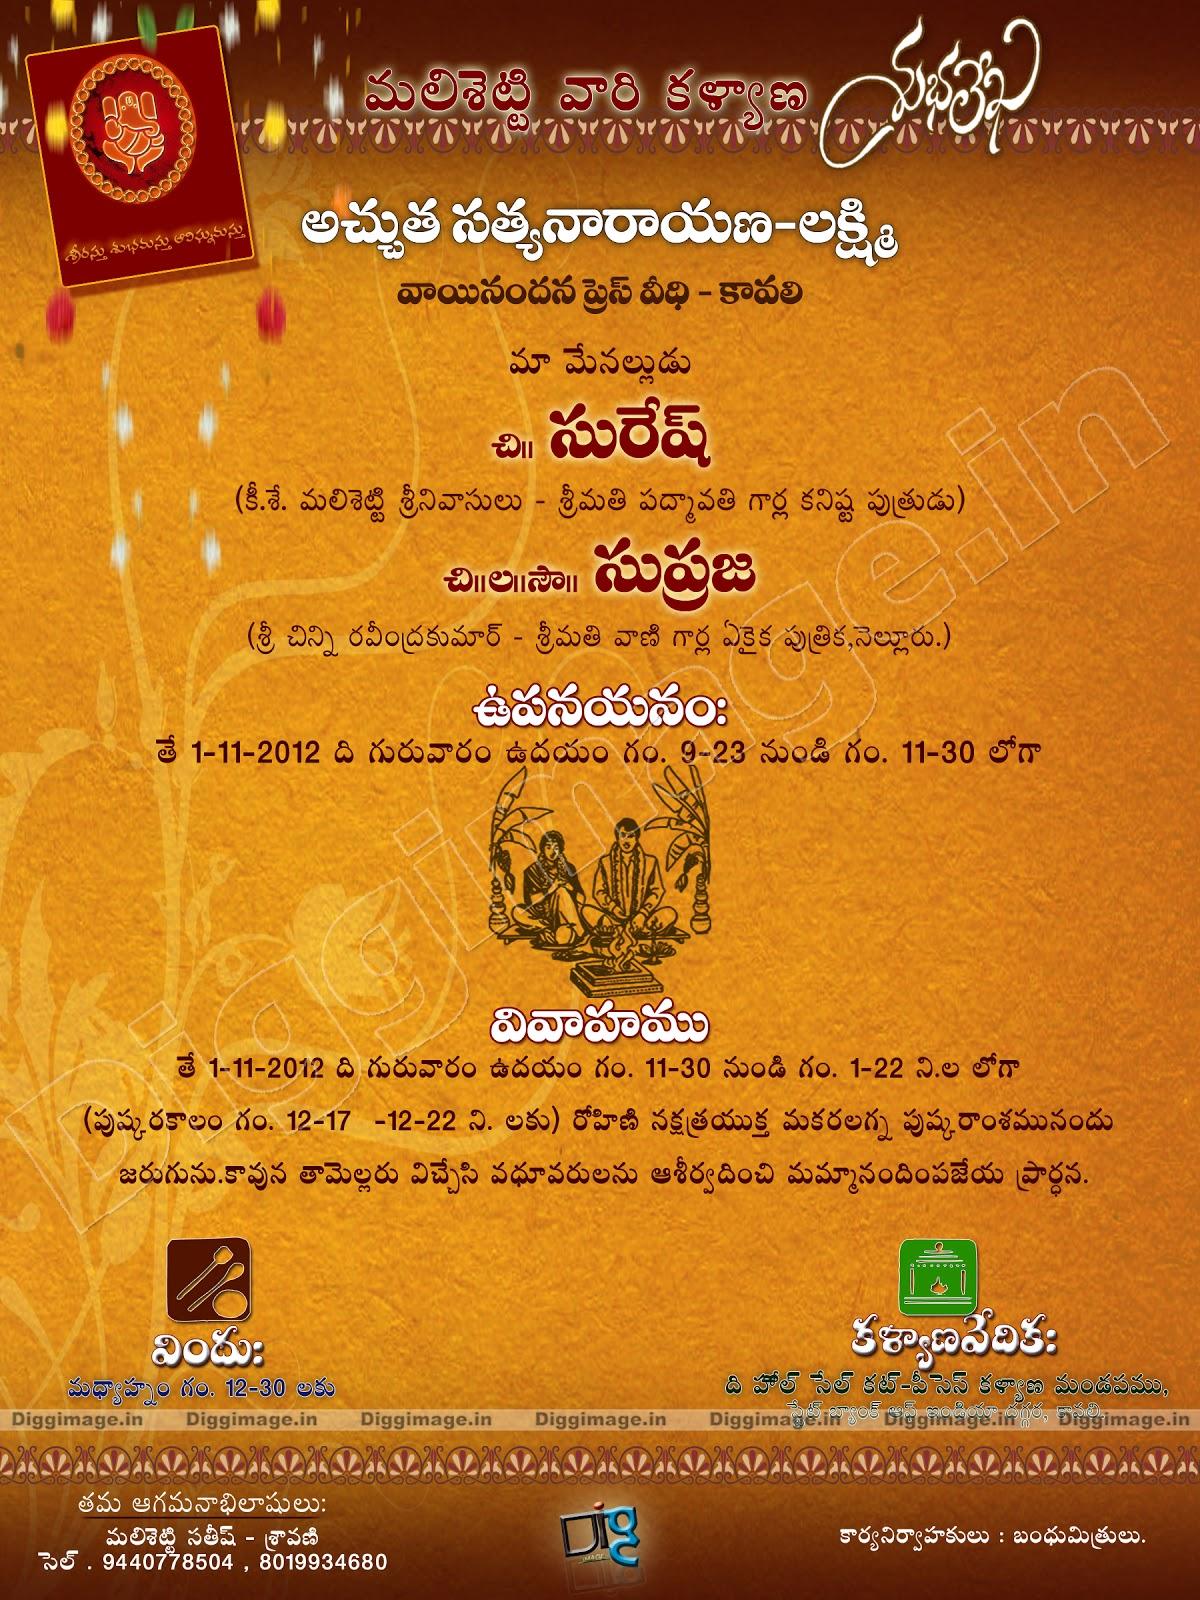 Christian Wedding Invitation Wording In Telugu Vadsbo For